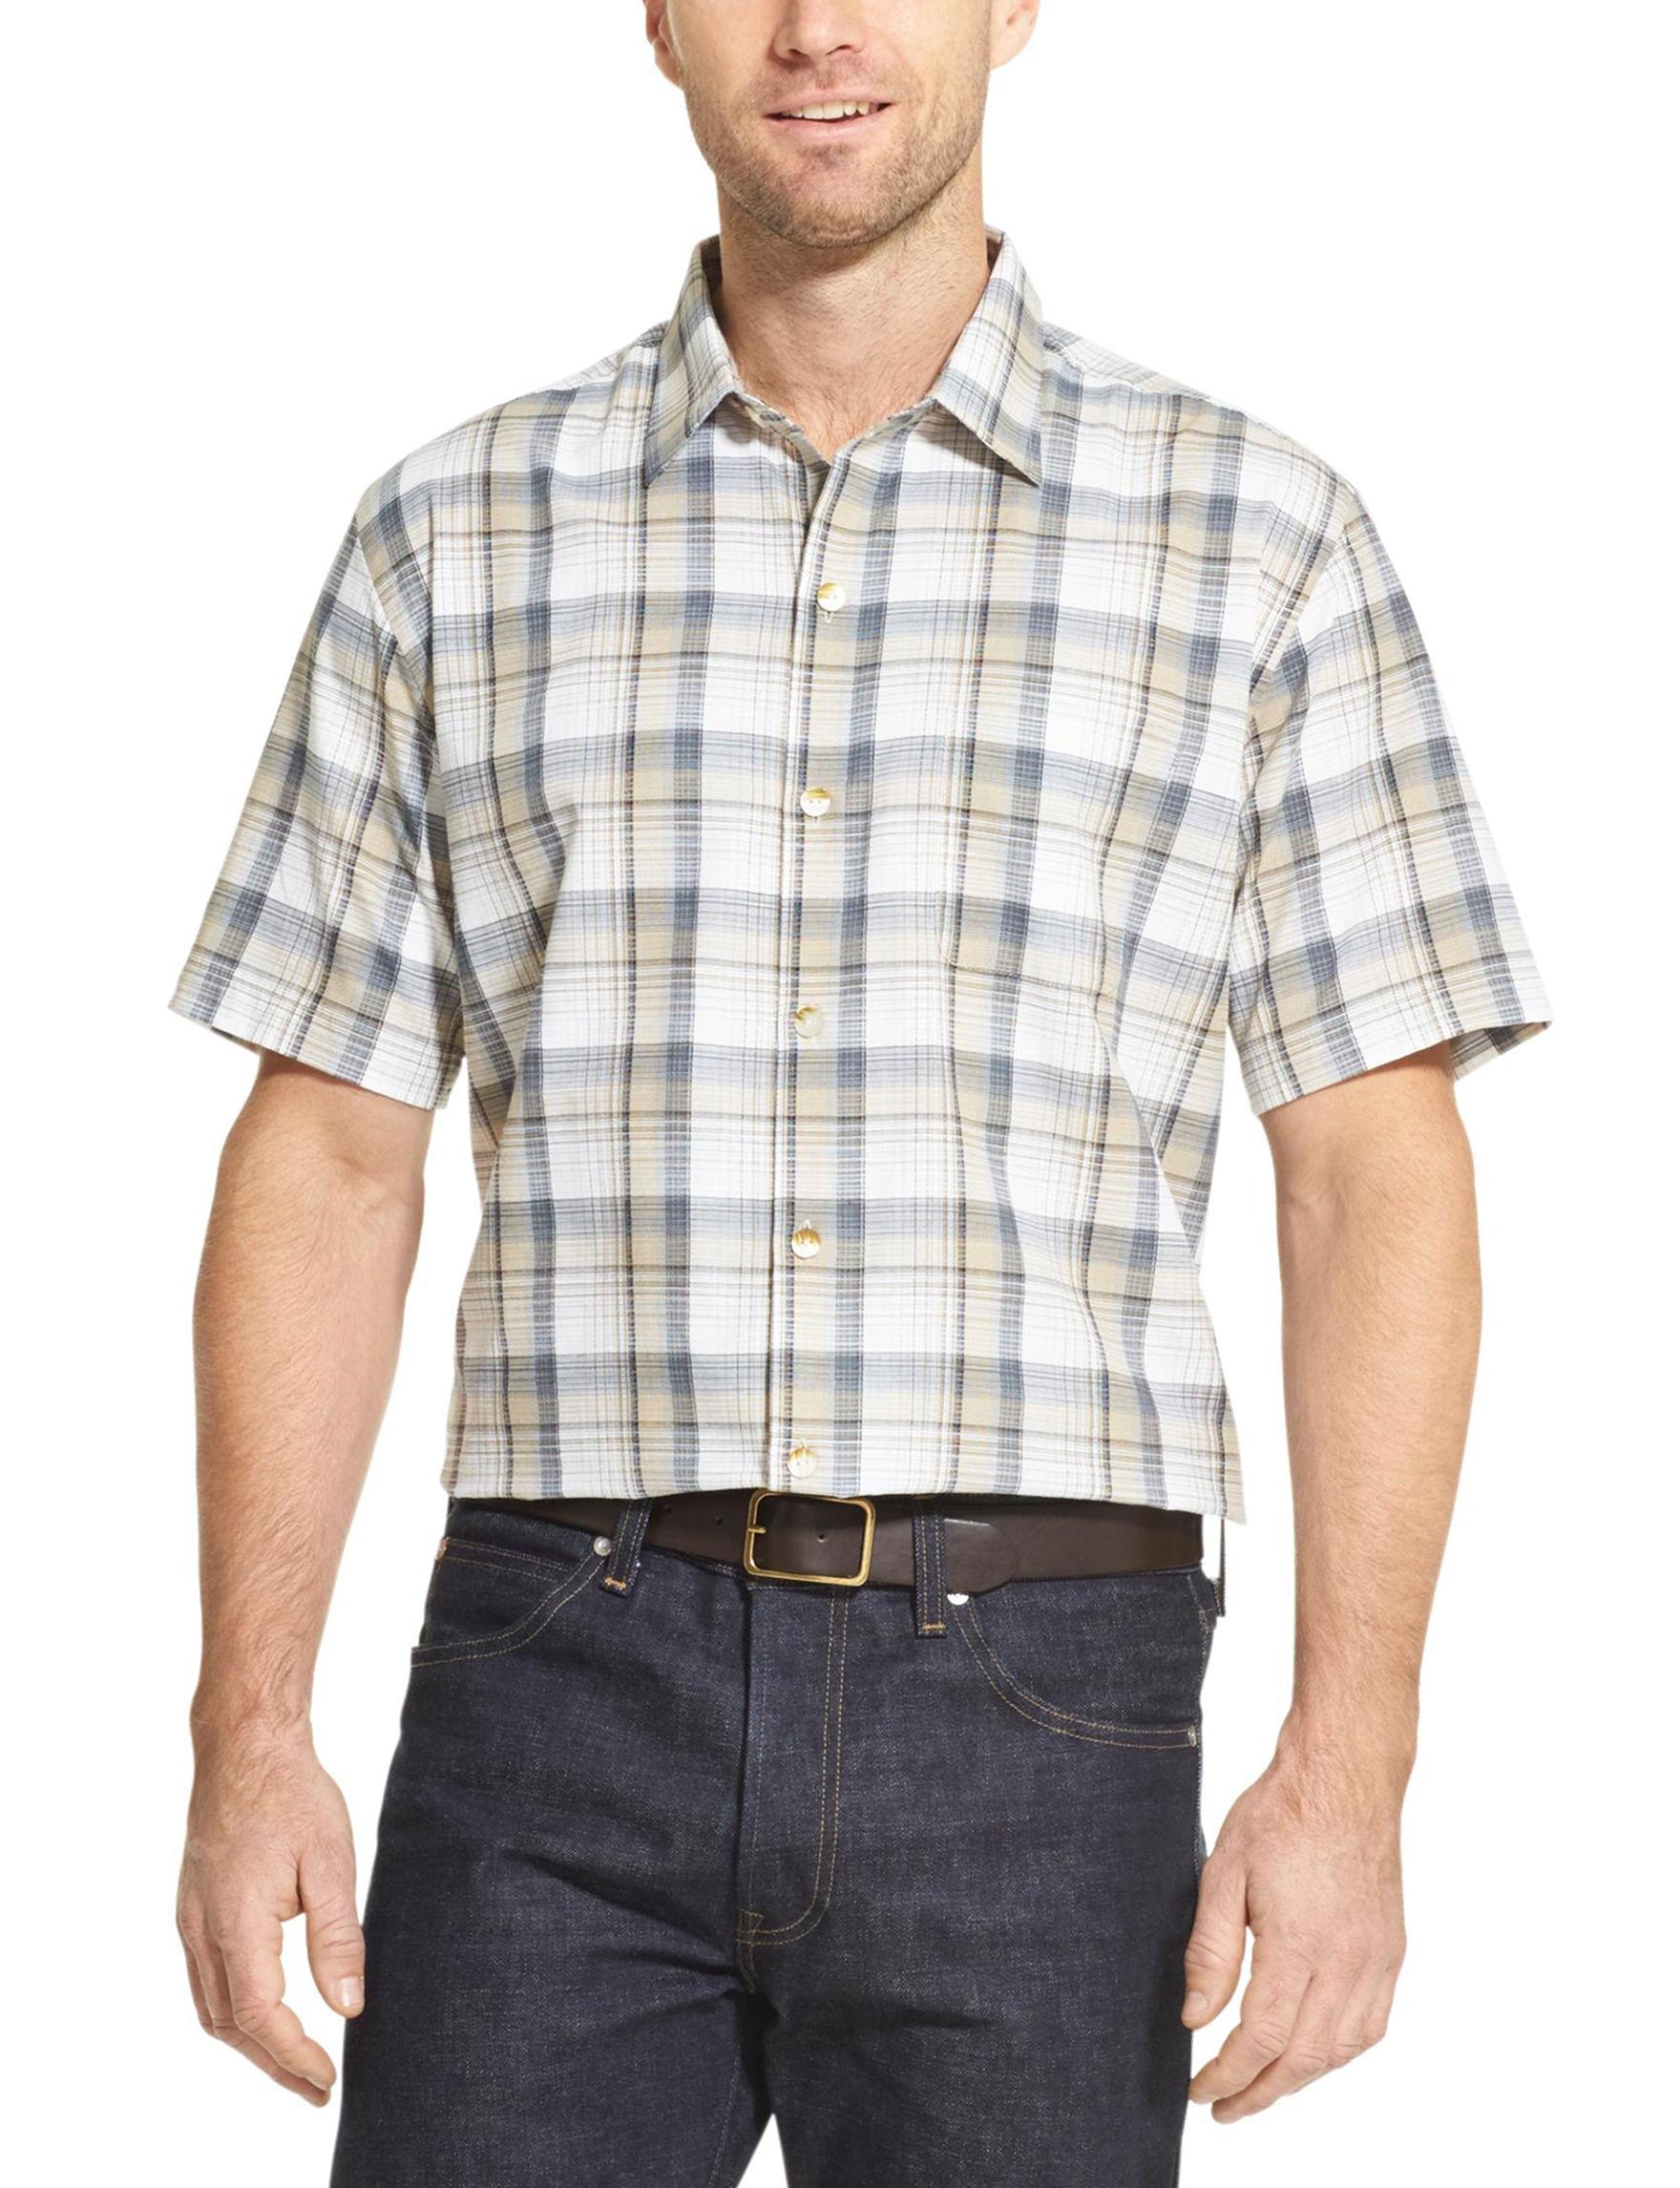 Van Heusen Chinchilla Casual Button Down Shirts